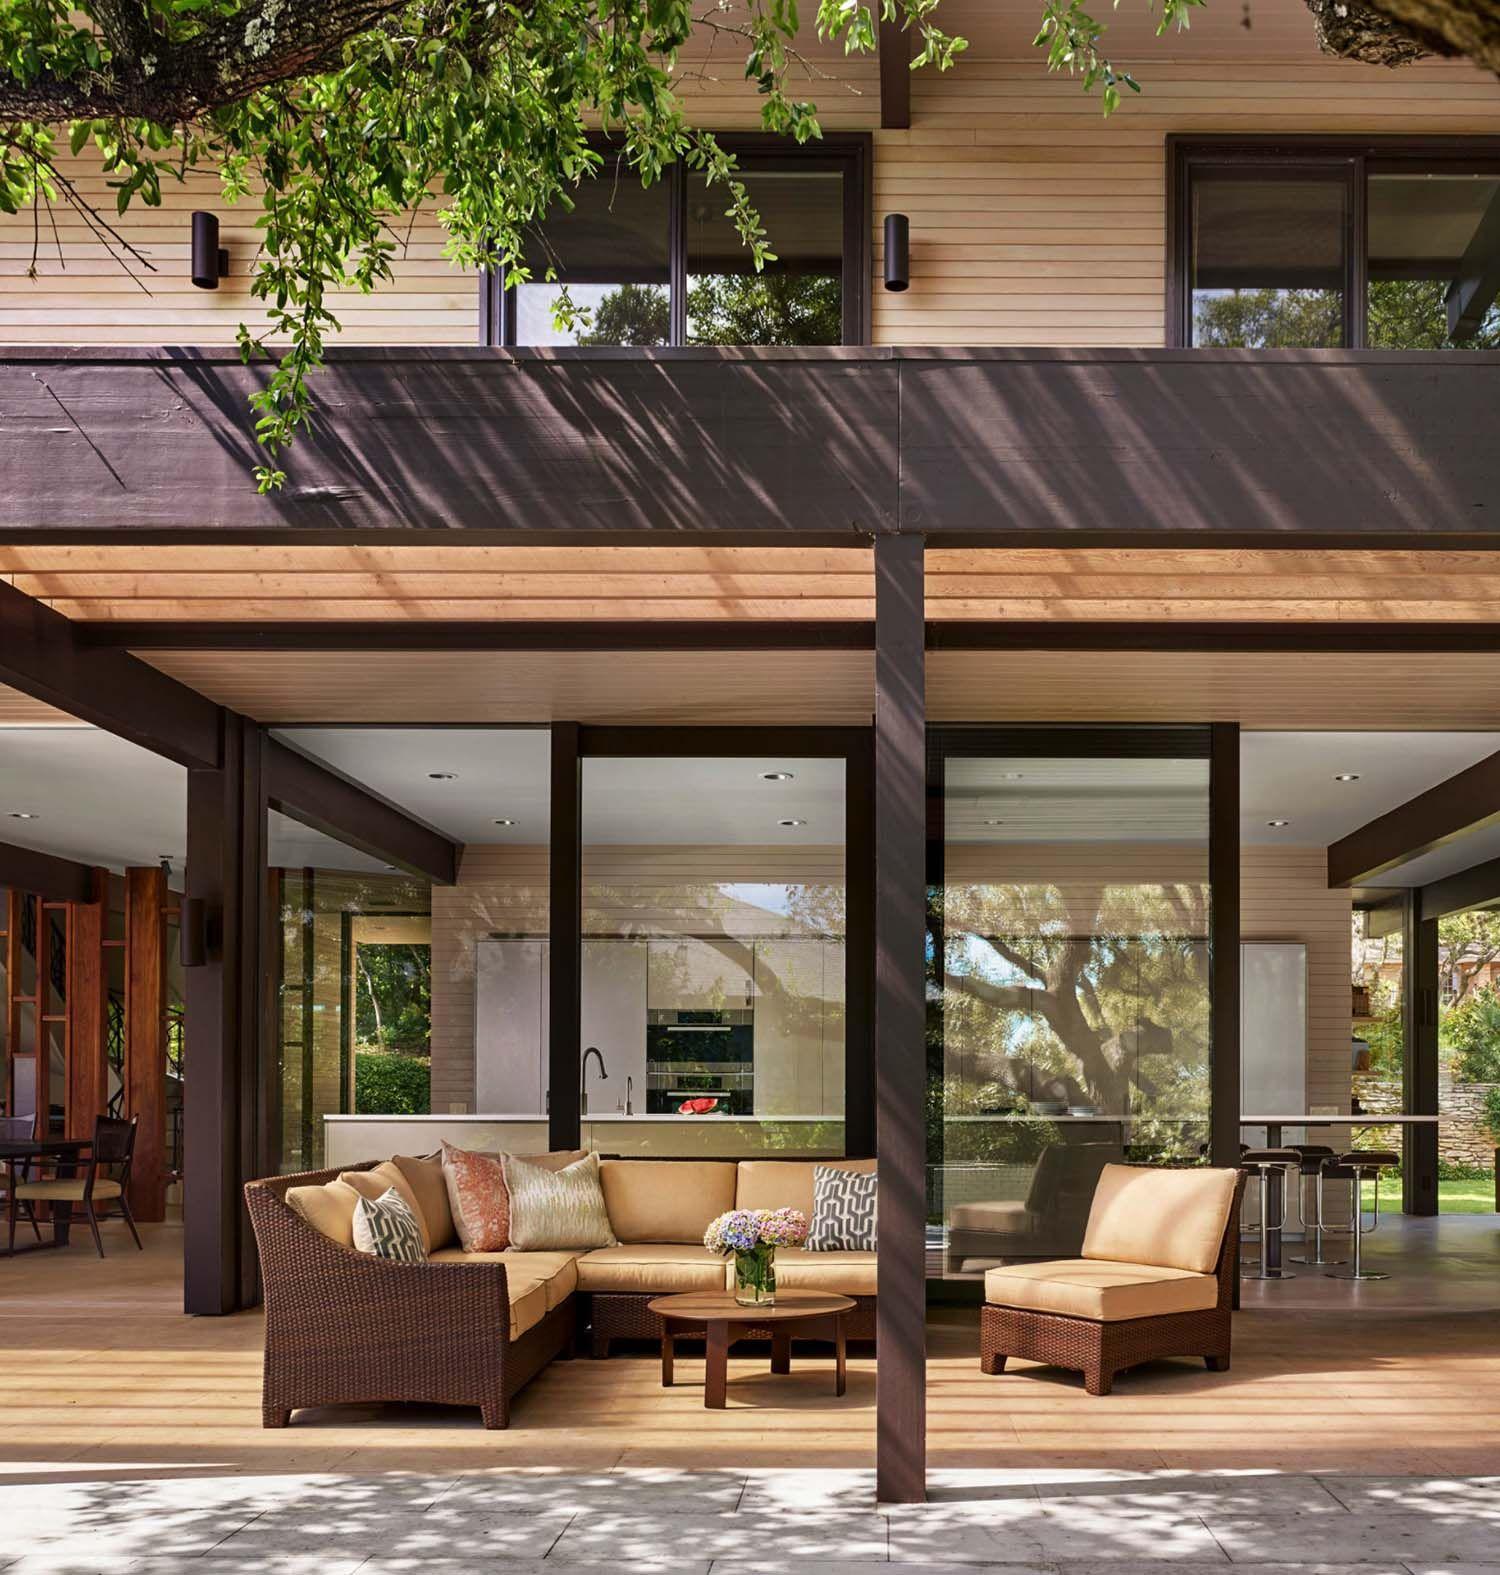 Midcentury modern renovation creates inspired living in austin